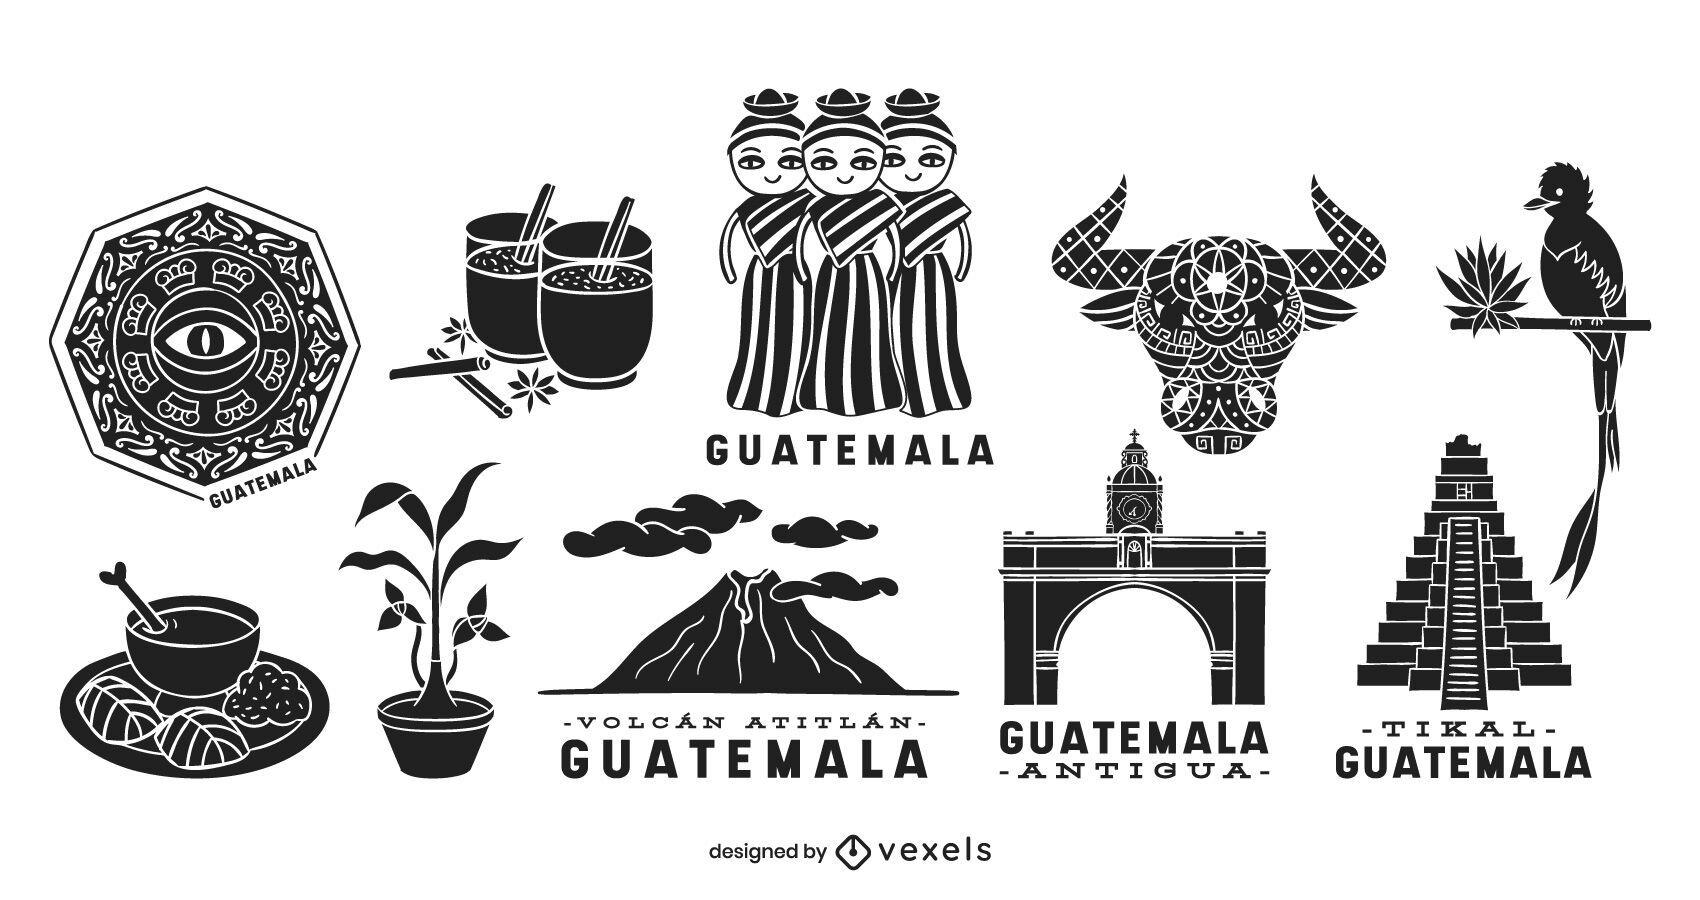 Guatemala elements silhouette set